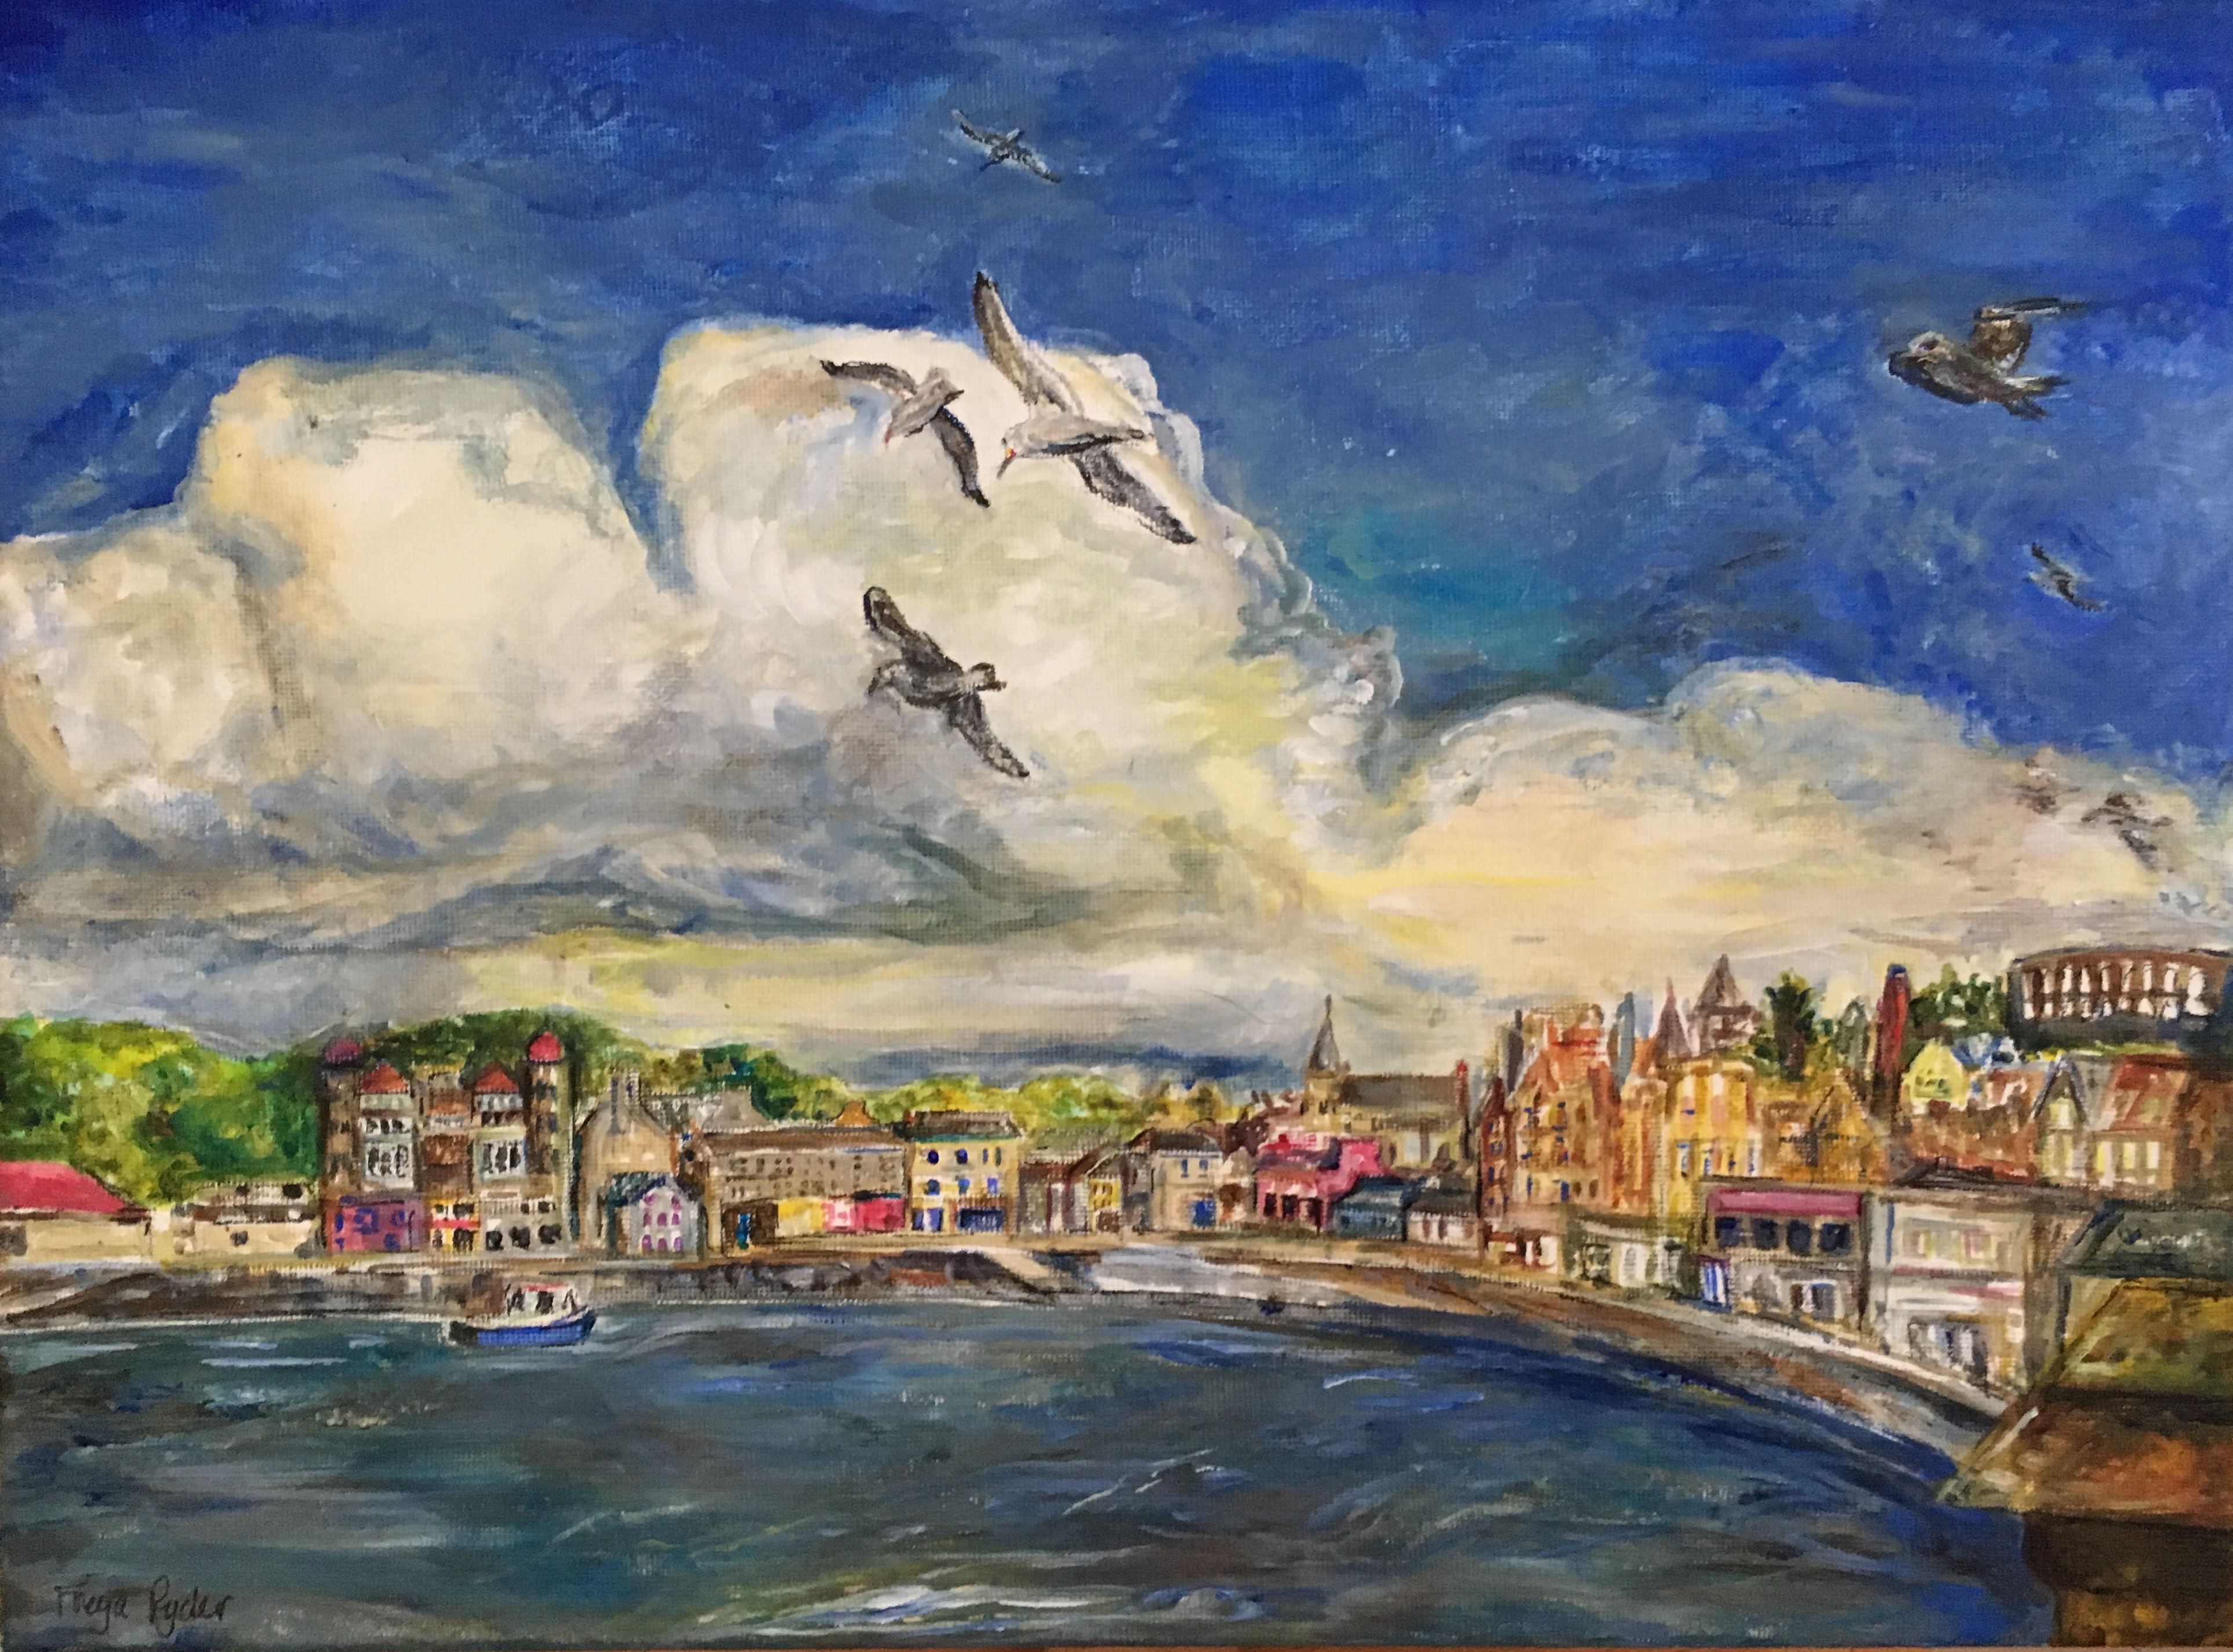 In free flight, by Freya Ryder